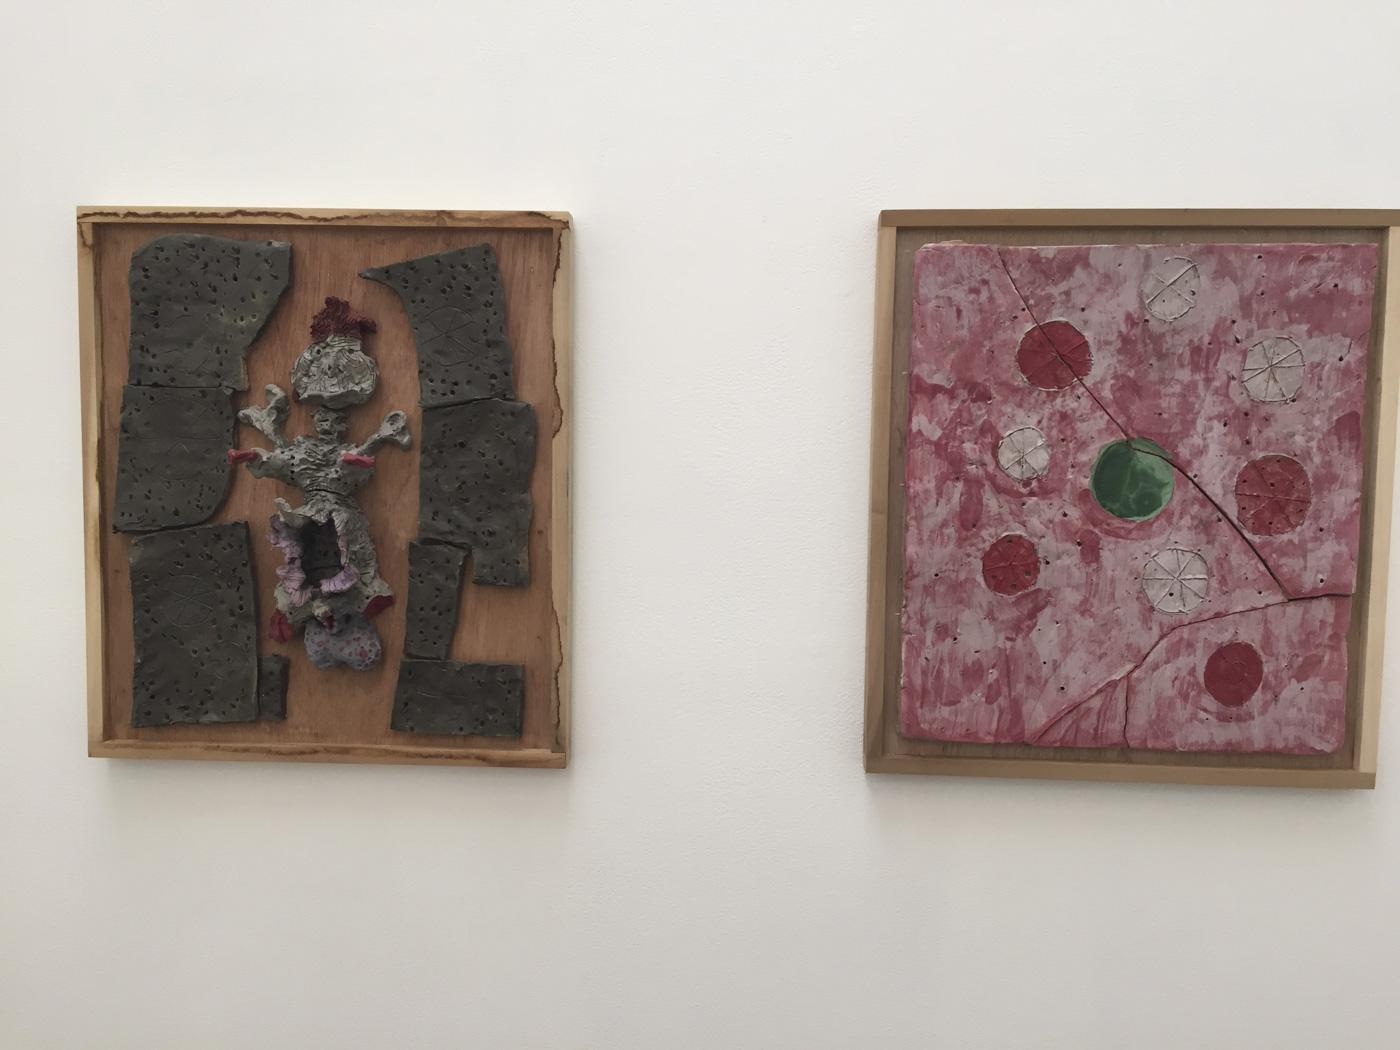 Richard Hawkins, Richard Telles Fine Art 12/12/15